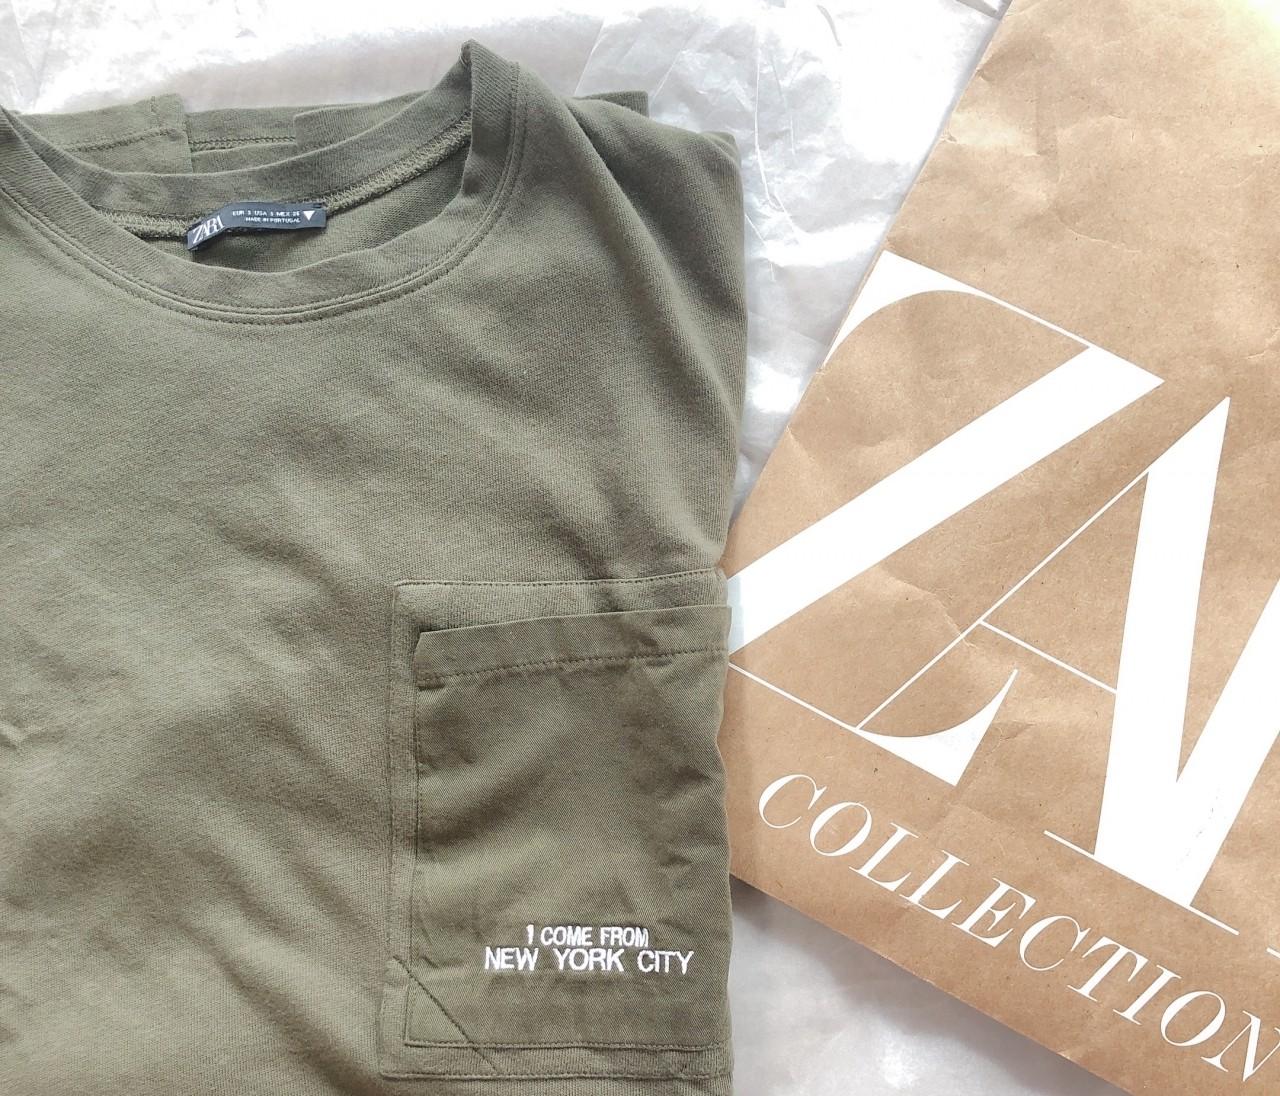 《ZARA online sale》でお得にget♡おうち時間のTシャツワンピ